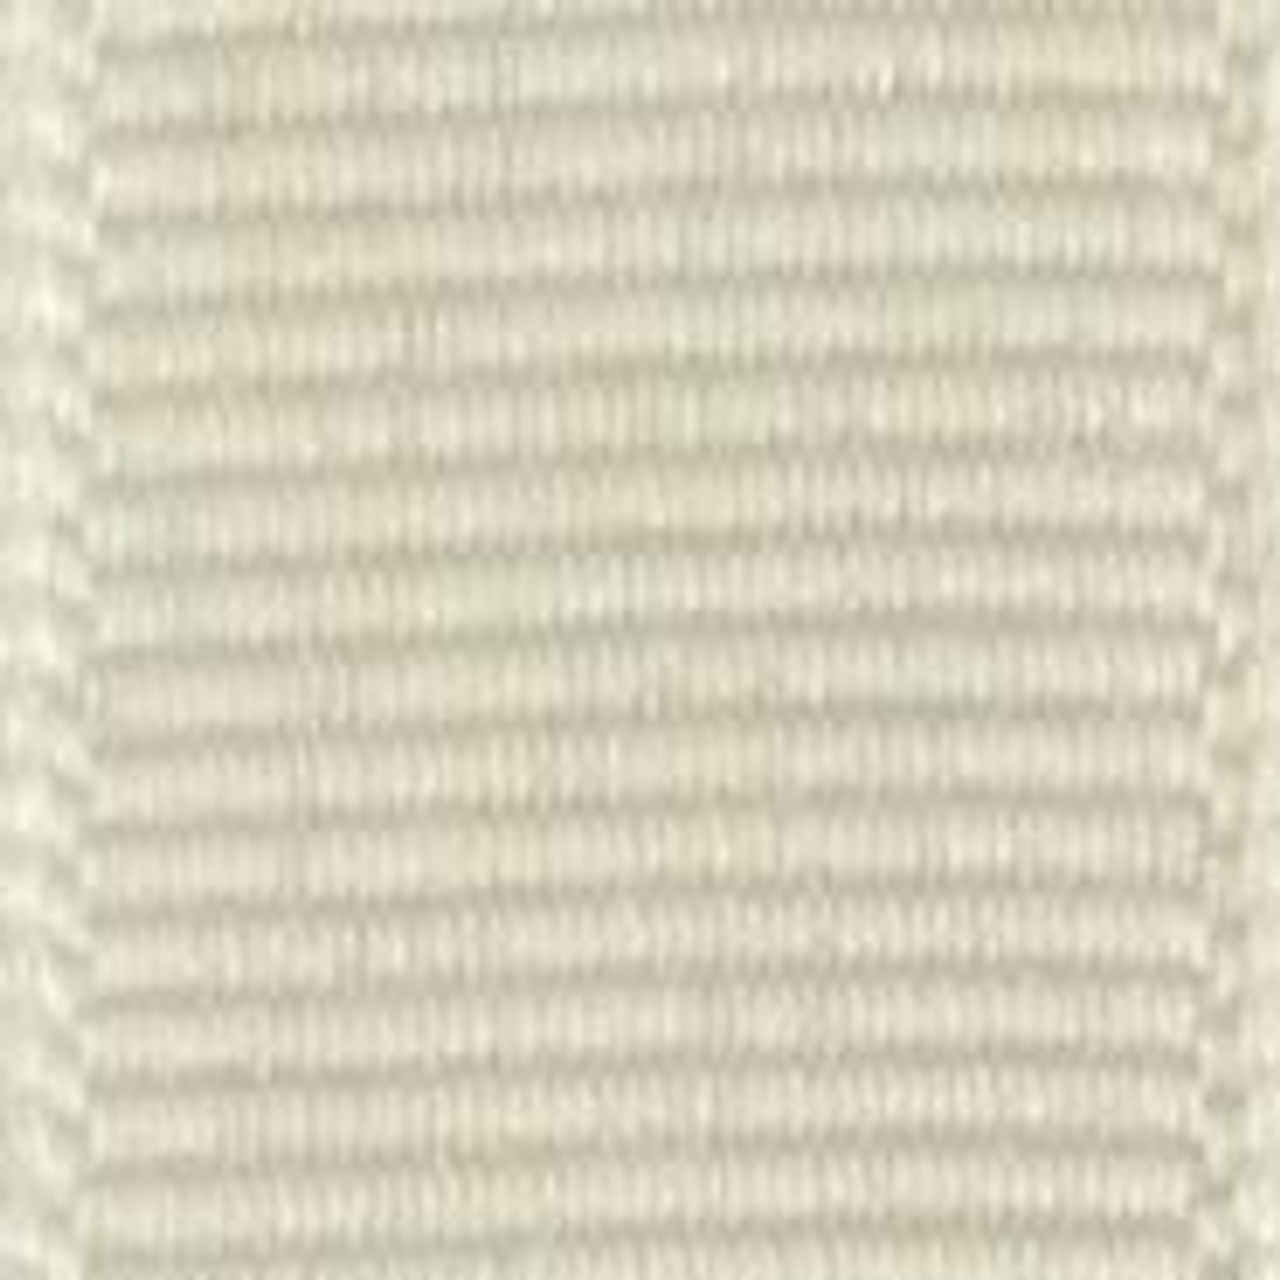 Antique White Solid Grosgrain Ribbon